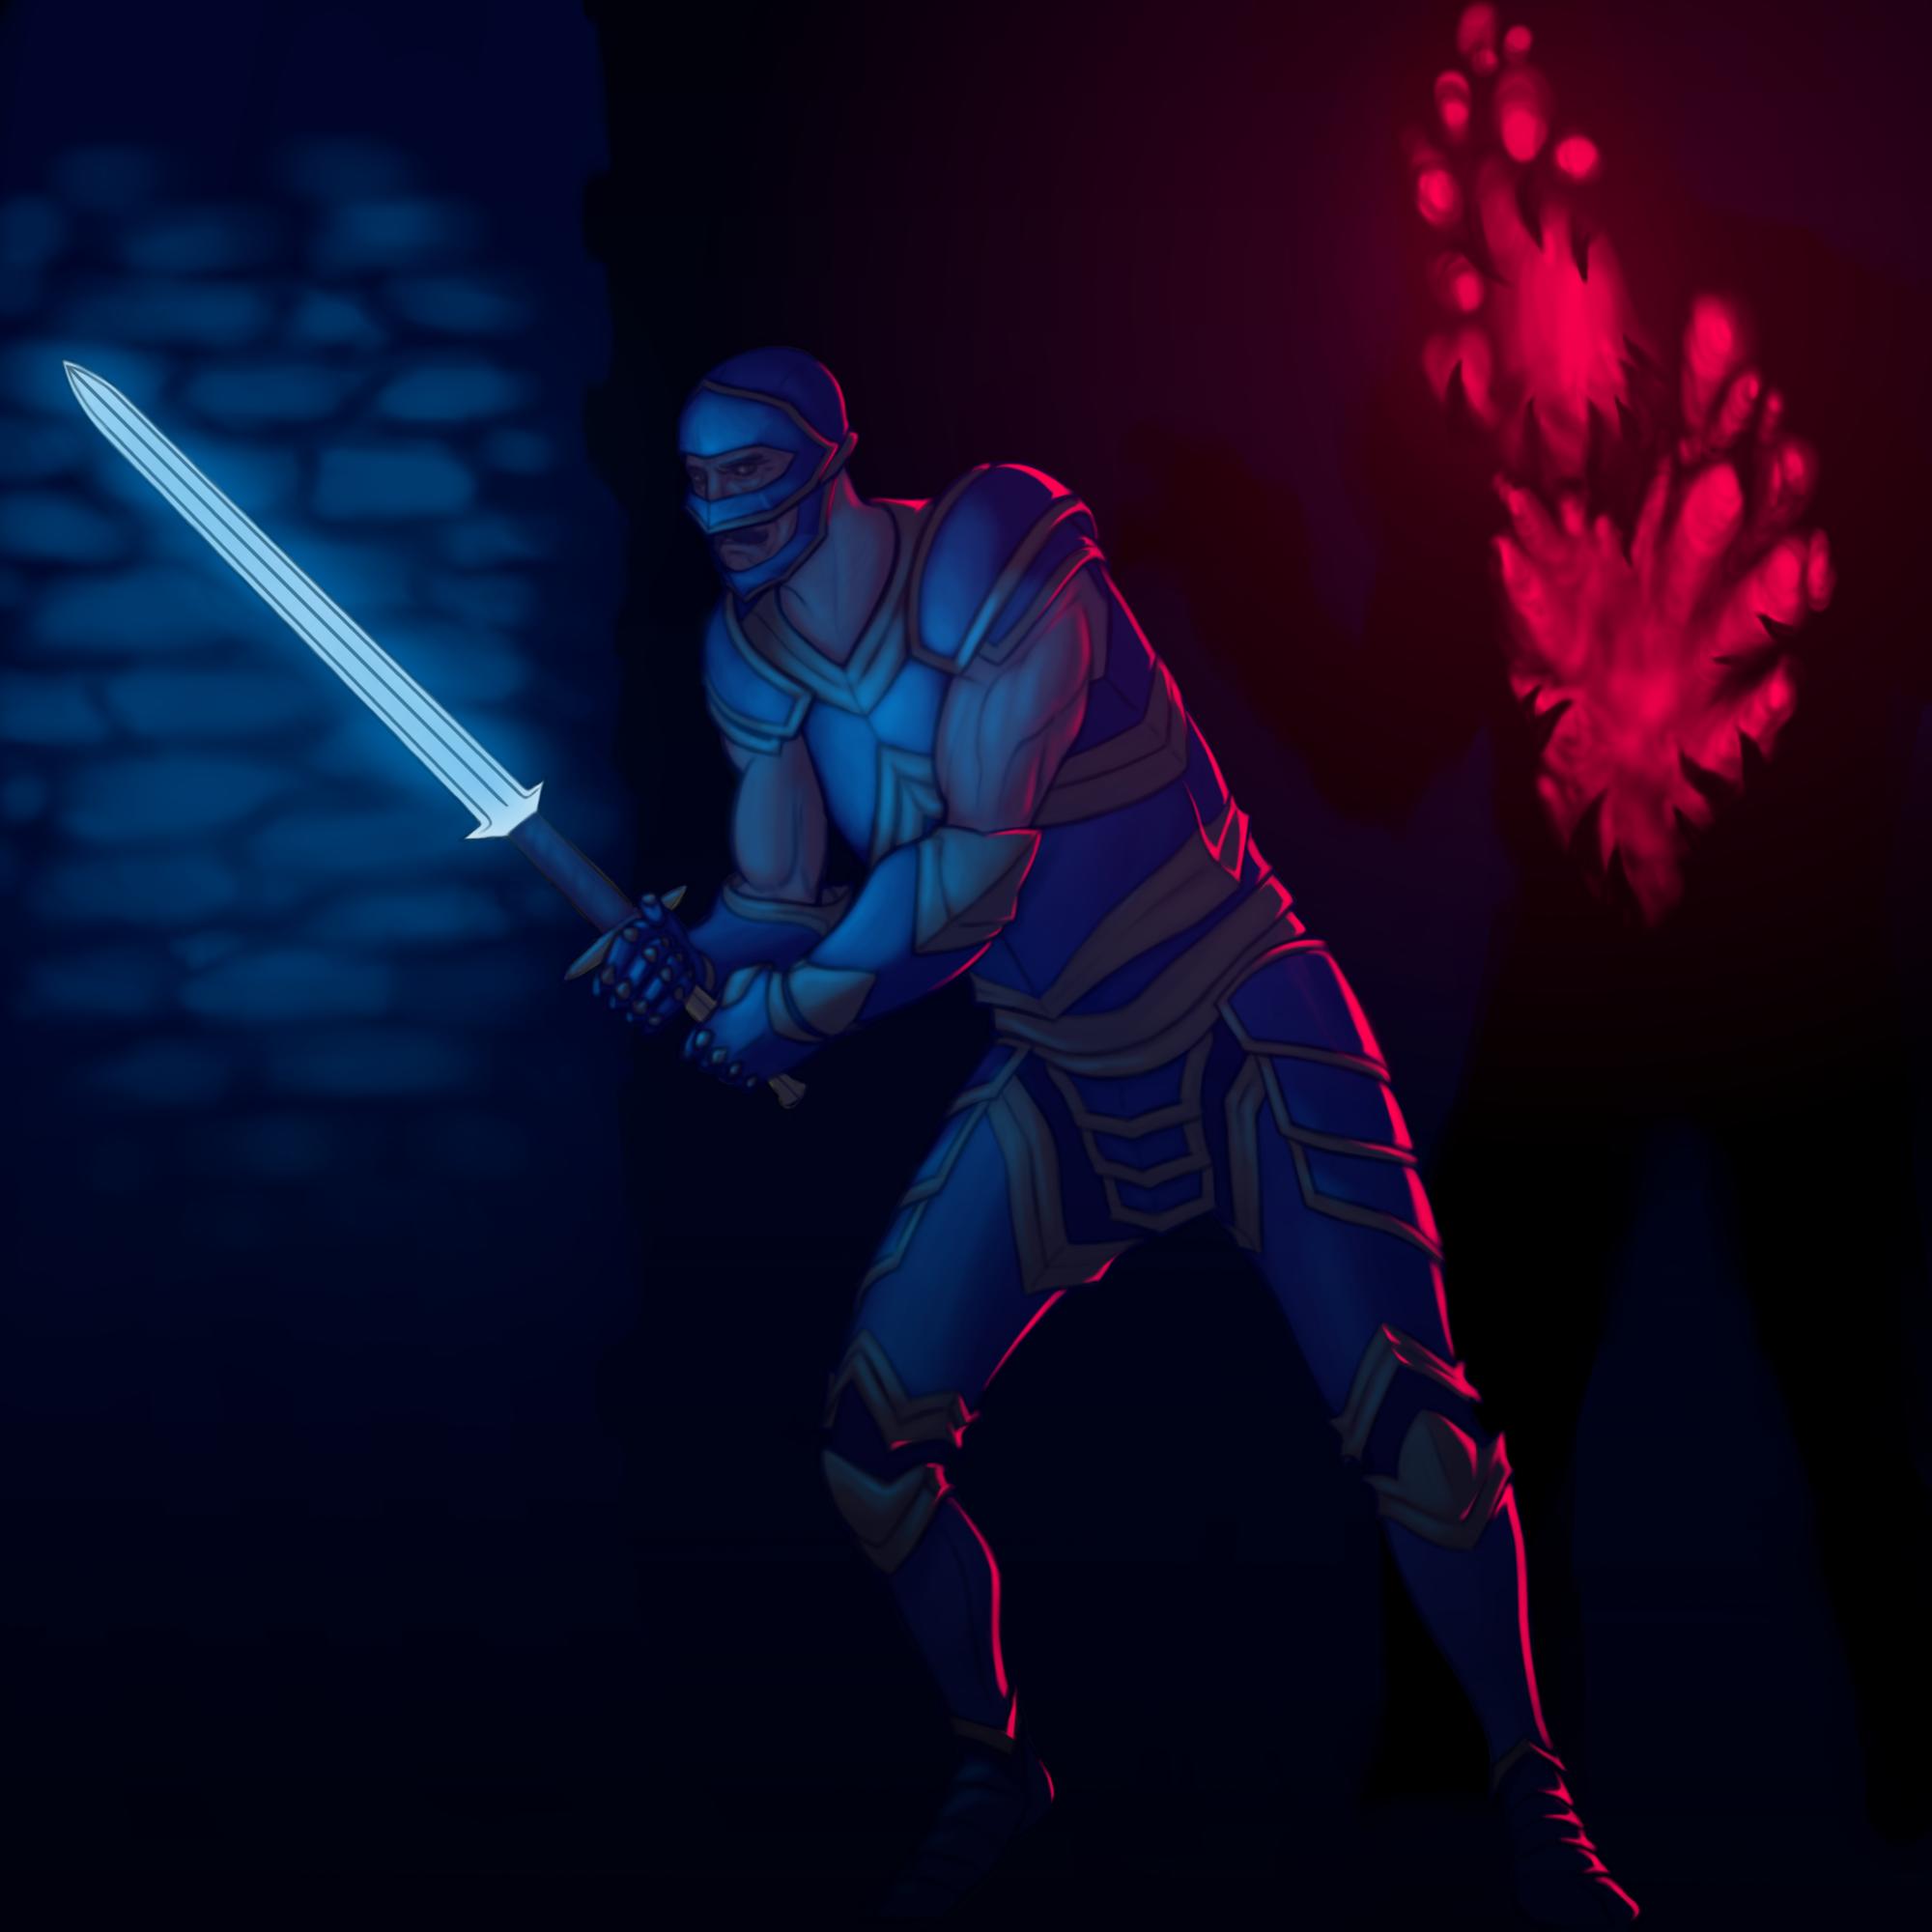 Blue Armored Adventurer